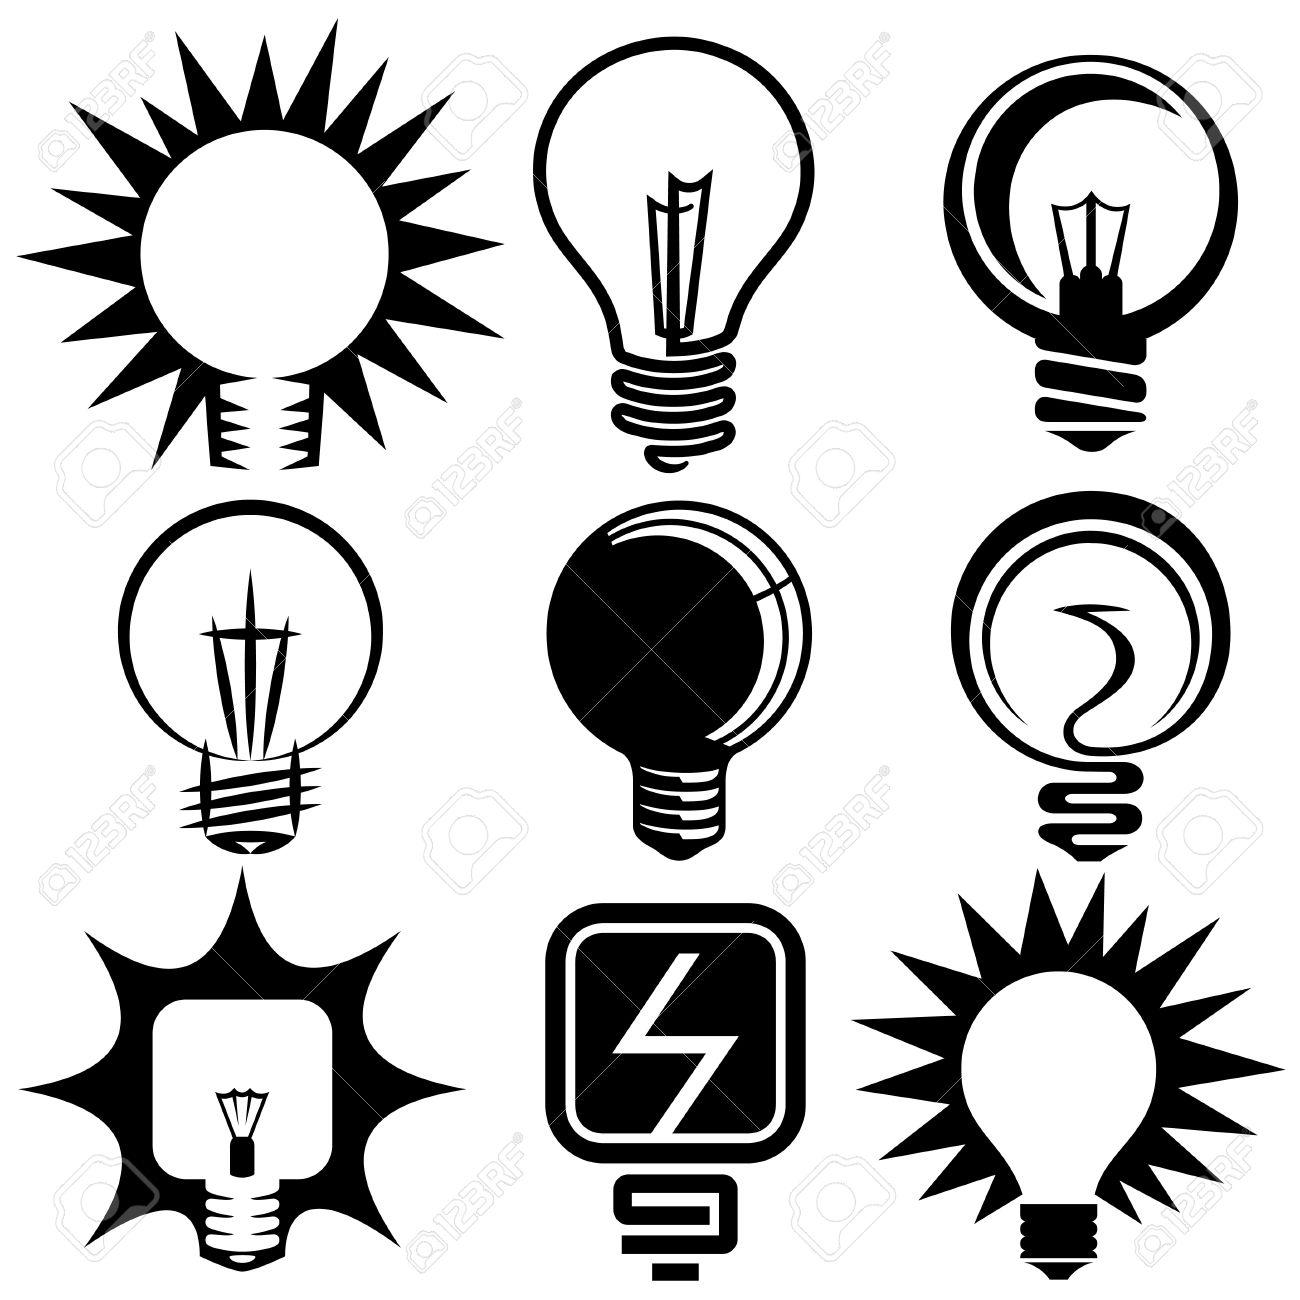 Electric Bulb Symbols And Icons Set Royalty Free Cliparts, Vectors.